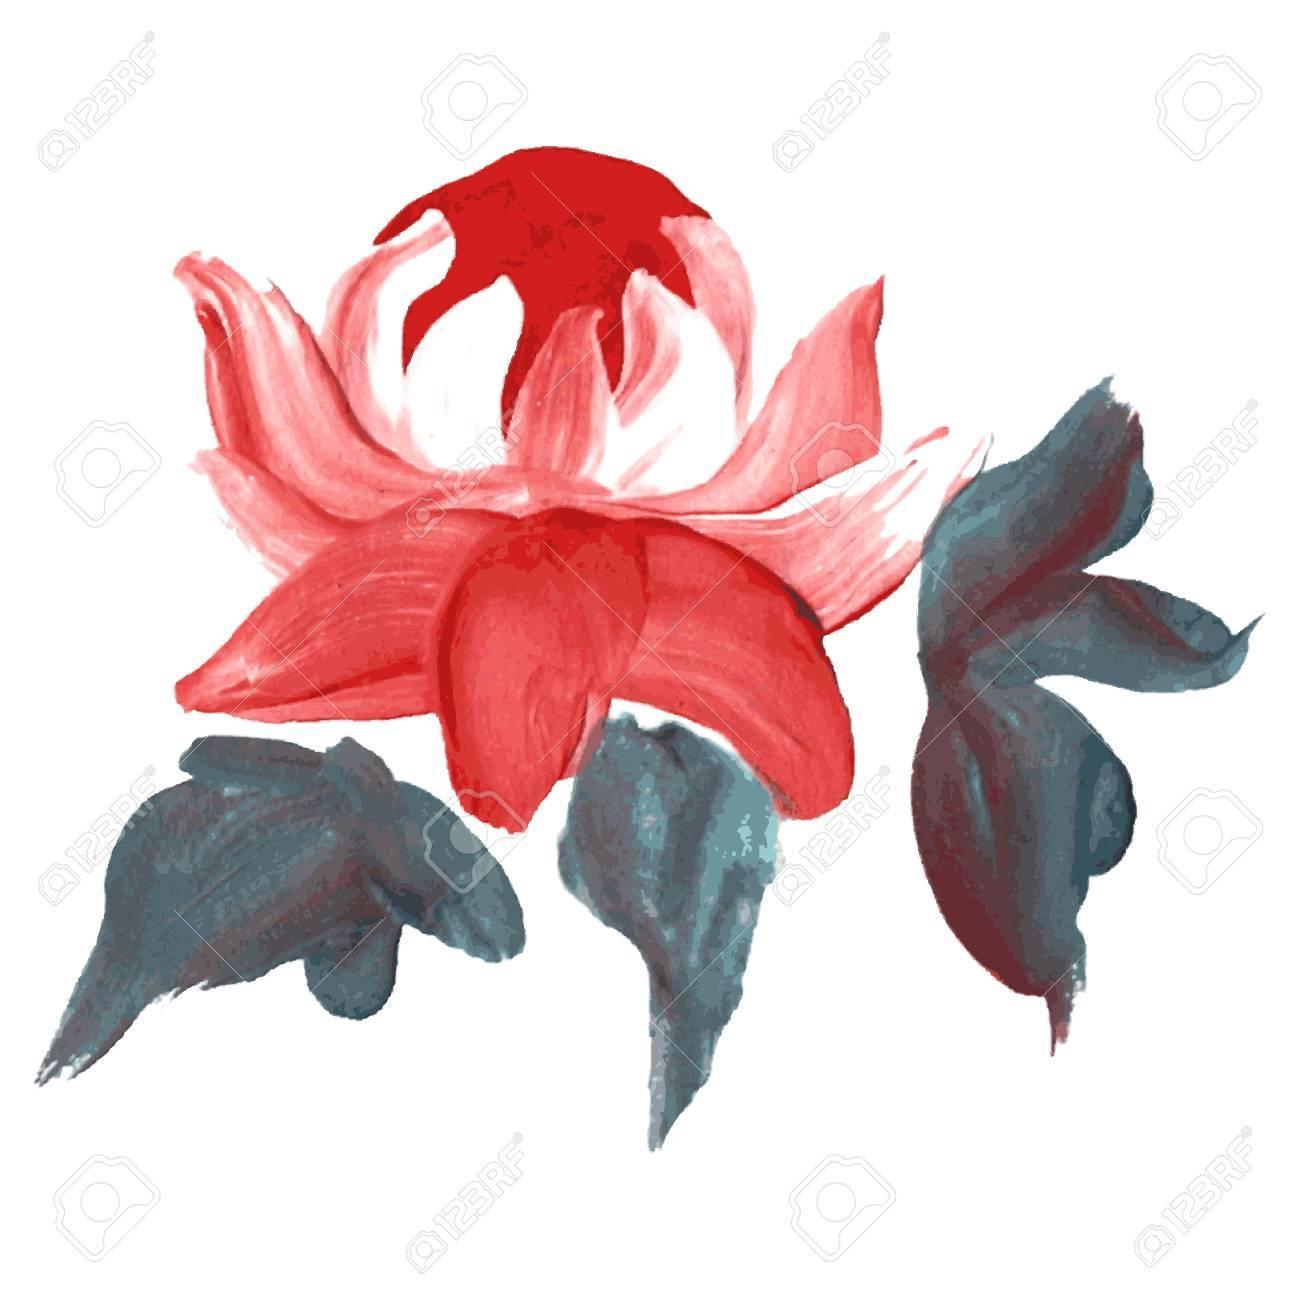 Dekorative Ol Gemalt Pfingstrose Blume Design Element Kann Fur